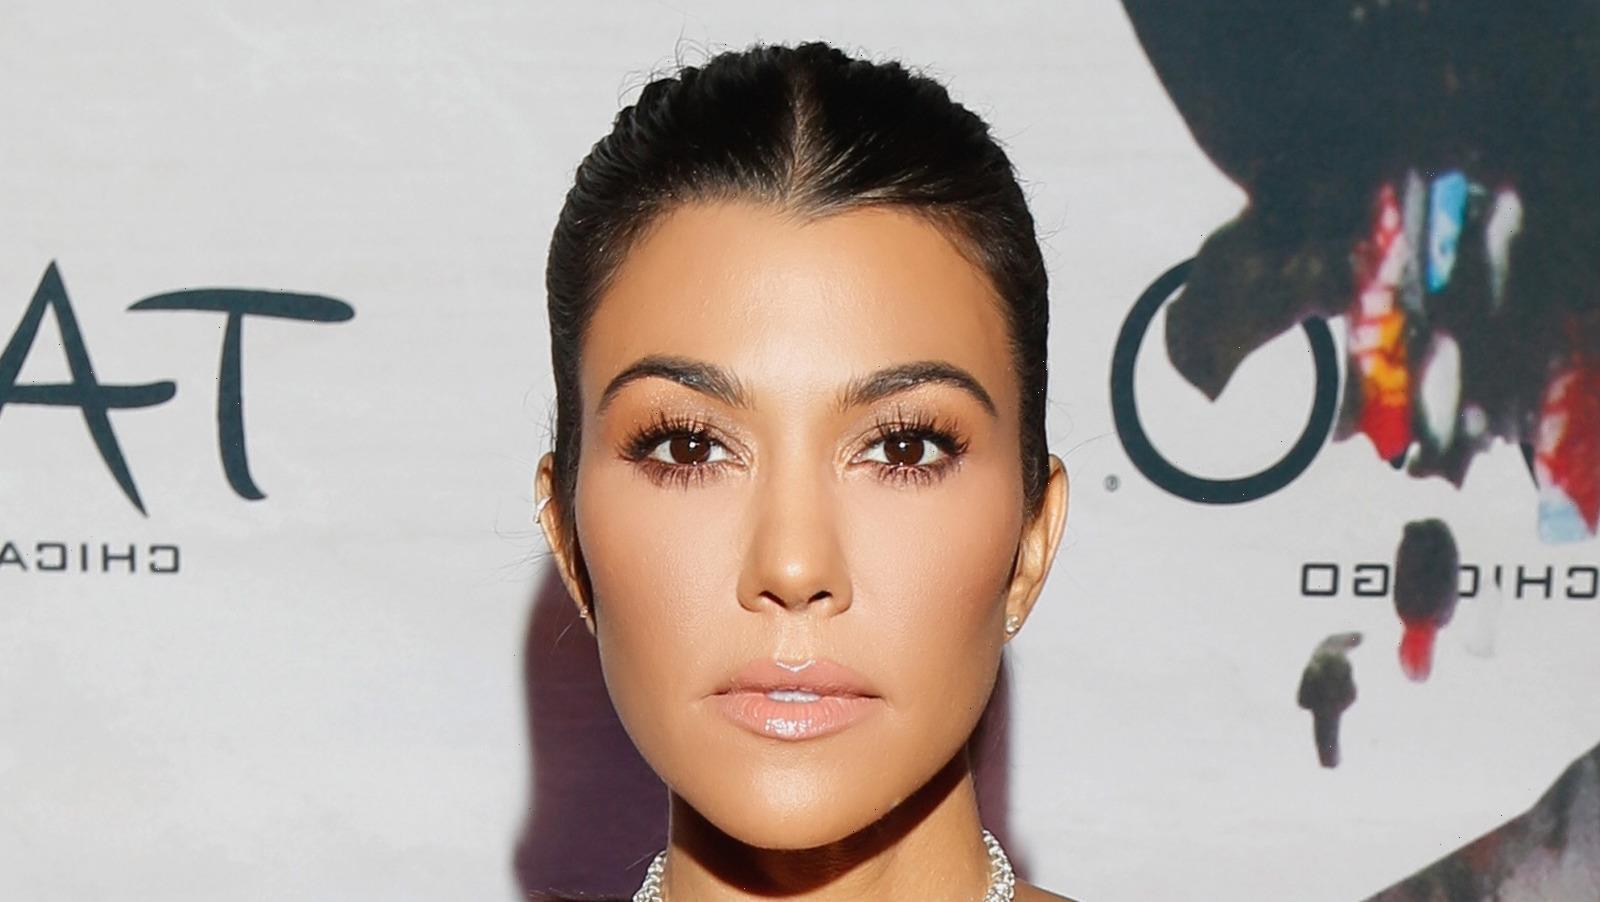 Why Kourtney Kardashian Really Thinks She's No Longer With Scott Disick